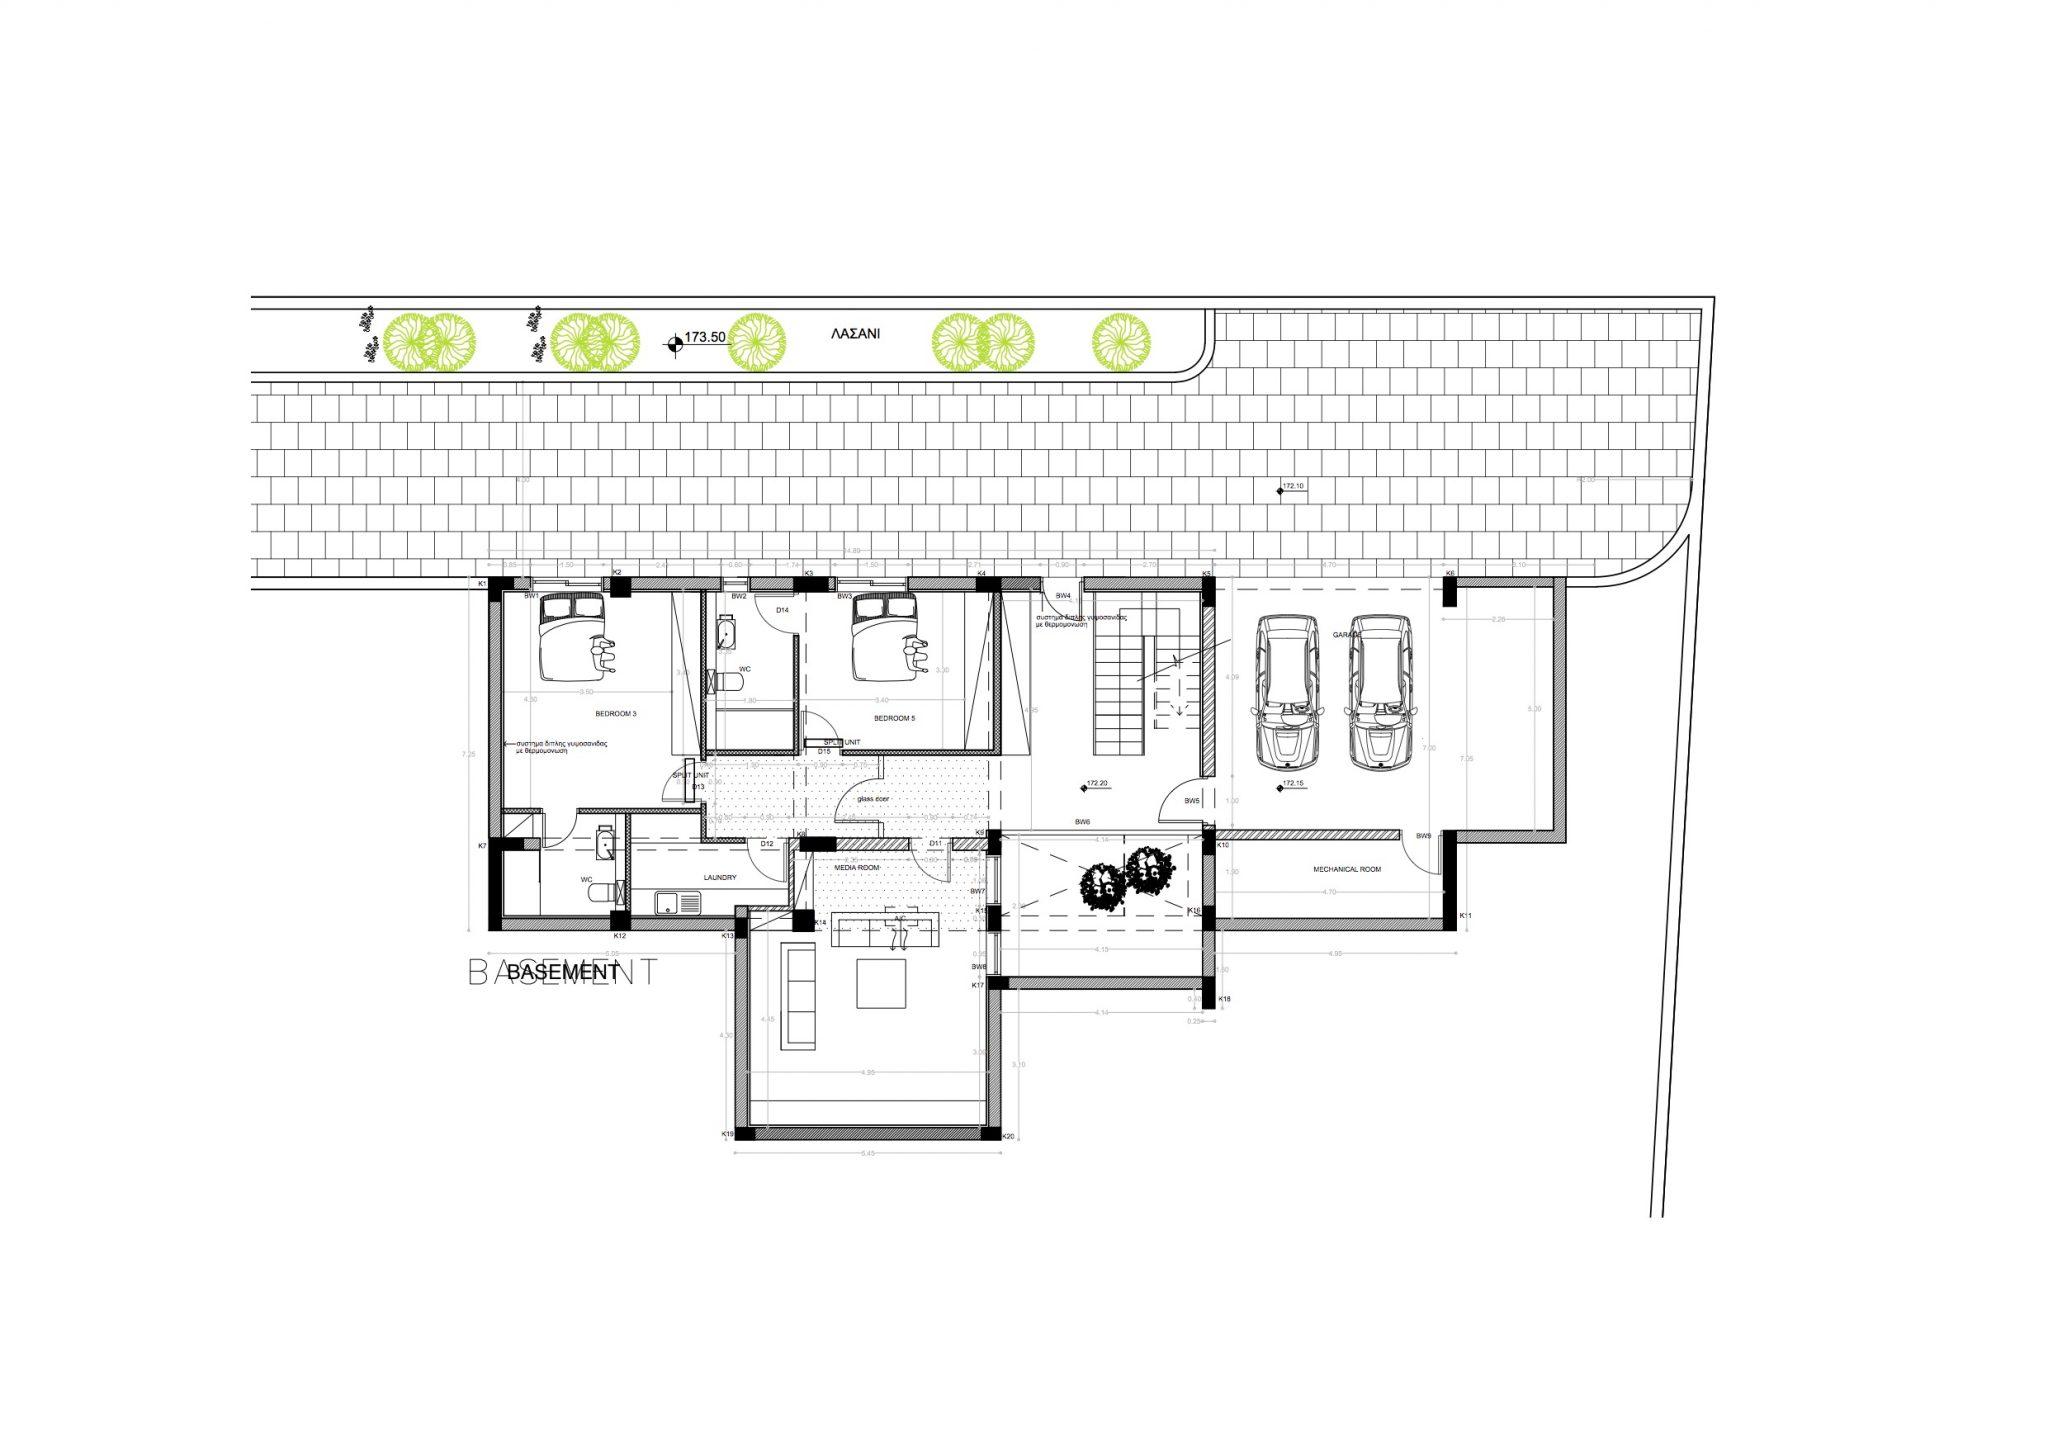 1538 - 5 Bedroom Villa - Aphrodite Hills floorplan 3